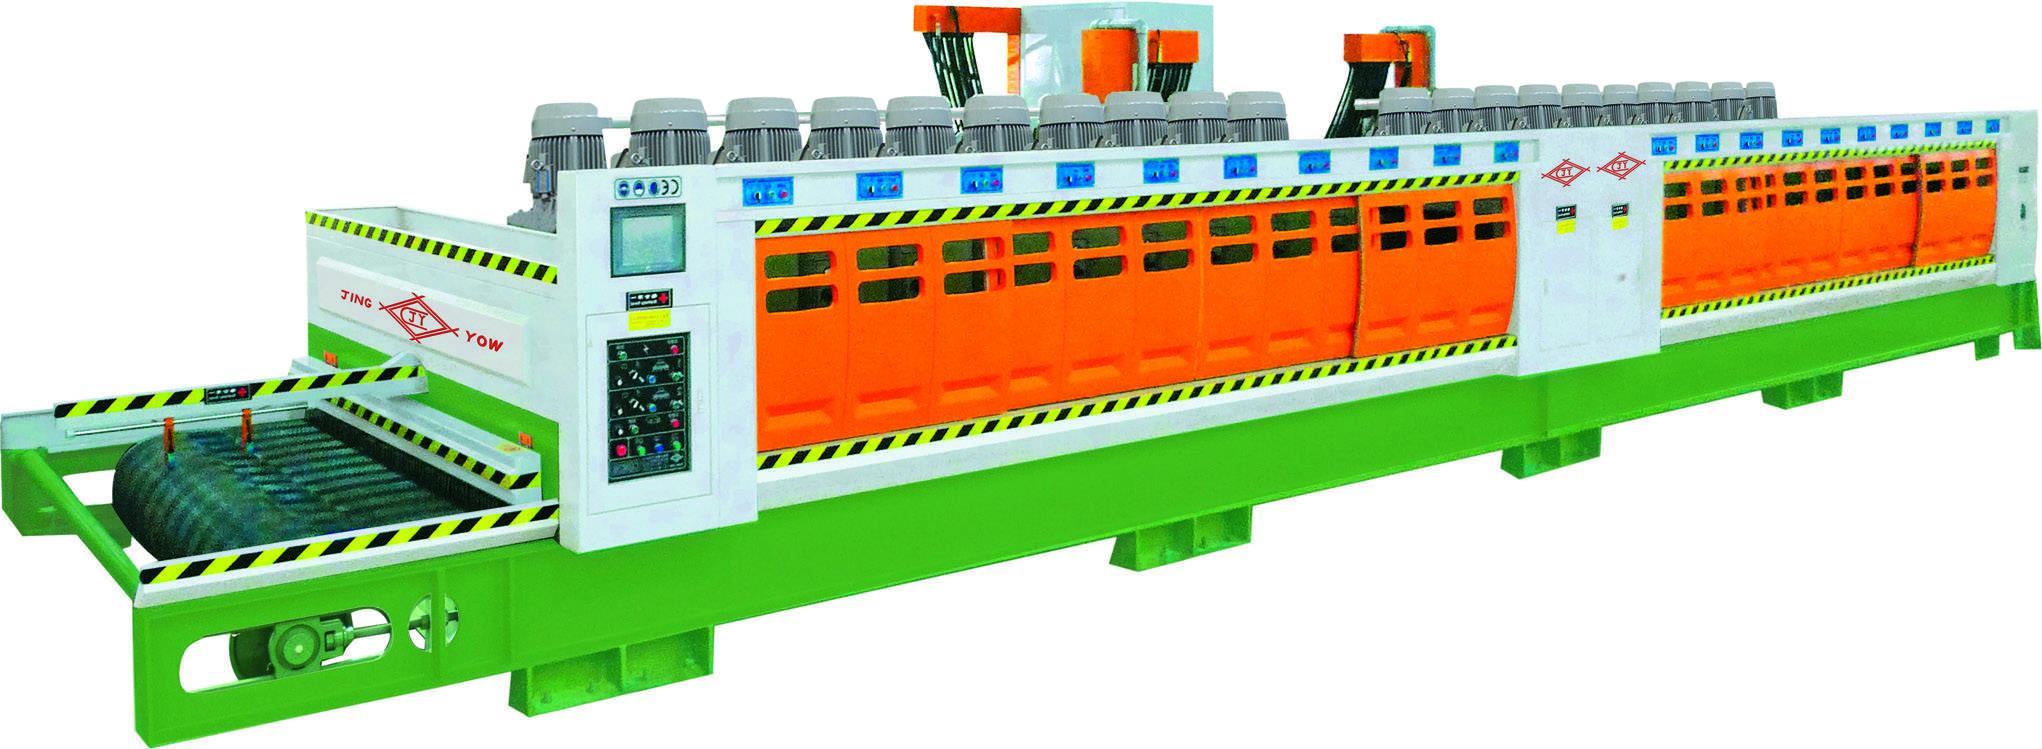 Automatic Marble Polishing Machine CB/CBM-2M-6/A (10/A);CB/CBM-2M-16/A (20/A)